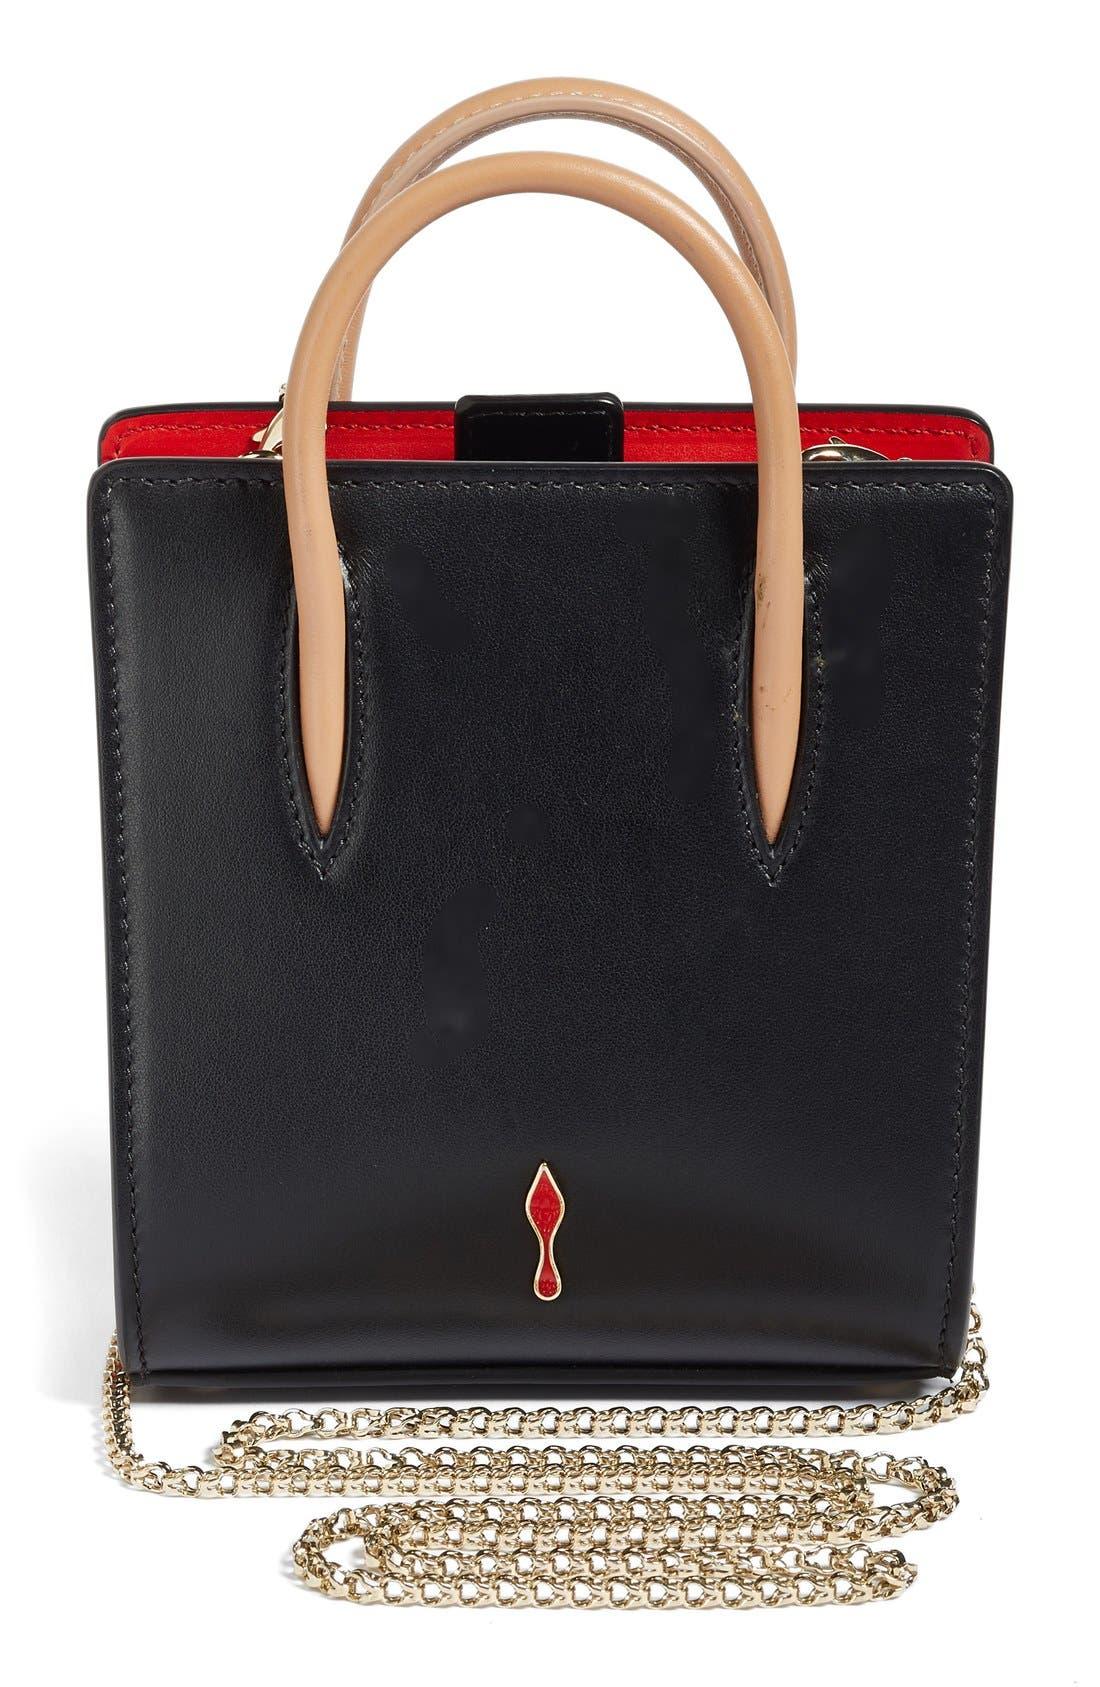 Nano Paloma Calfskin Leather Tote,                             Alternate thumbnail 2, color,                             Black/Brown